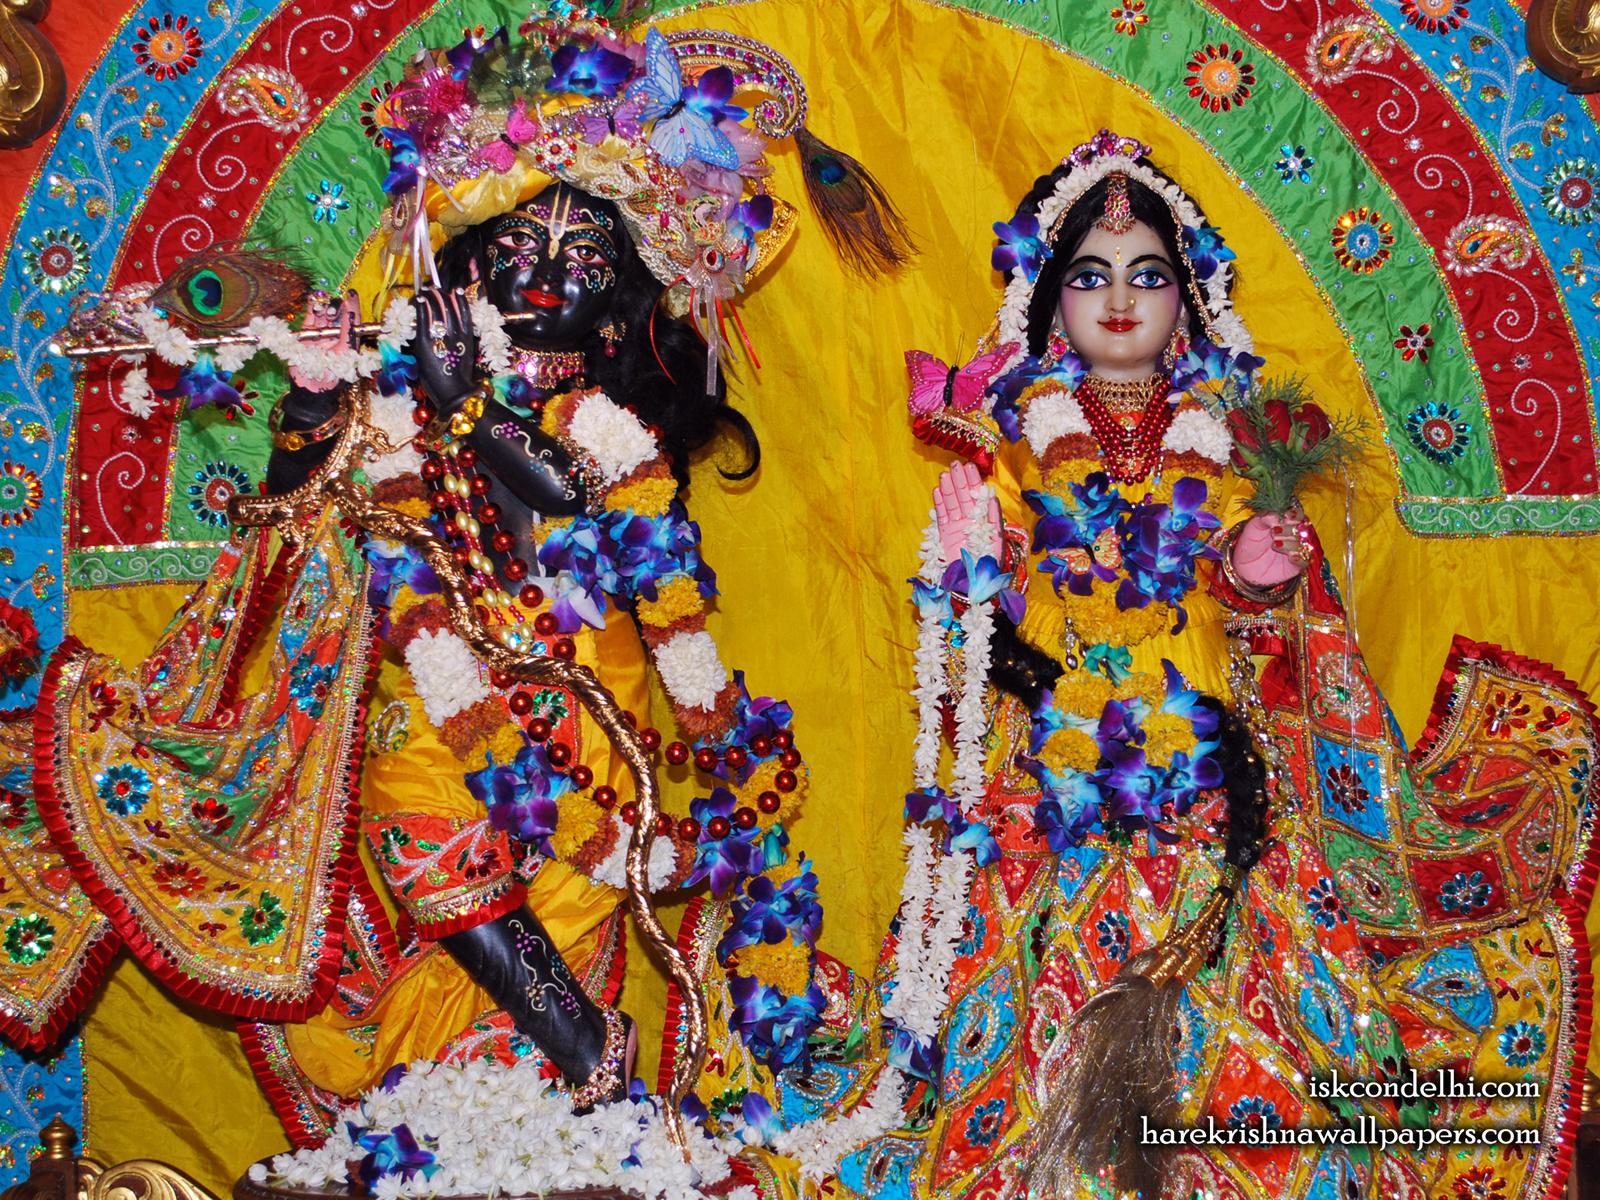 Sri Sri Radha Parthasarathi Wallpaper (012) Size1600x1200 Download